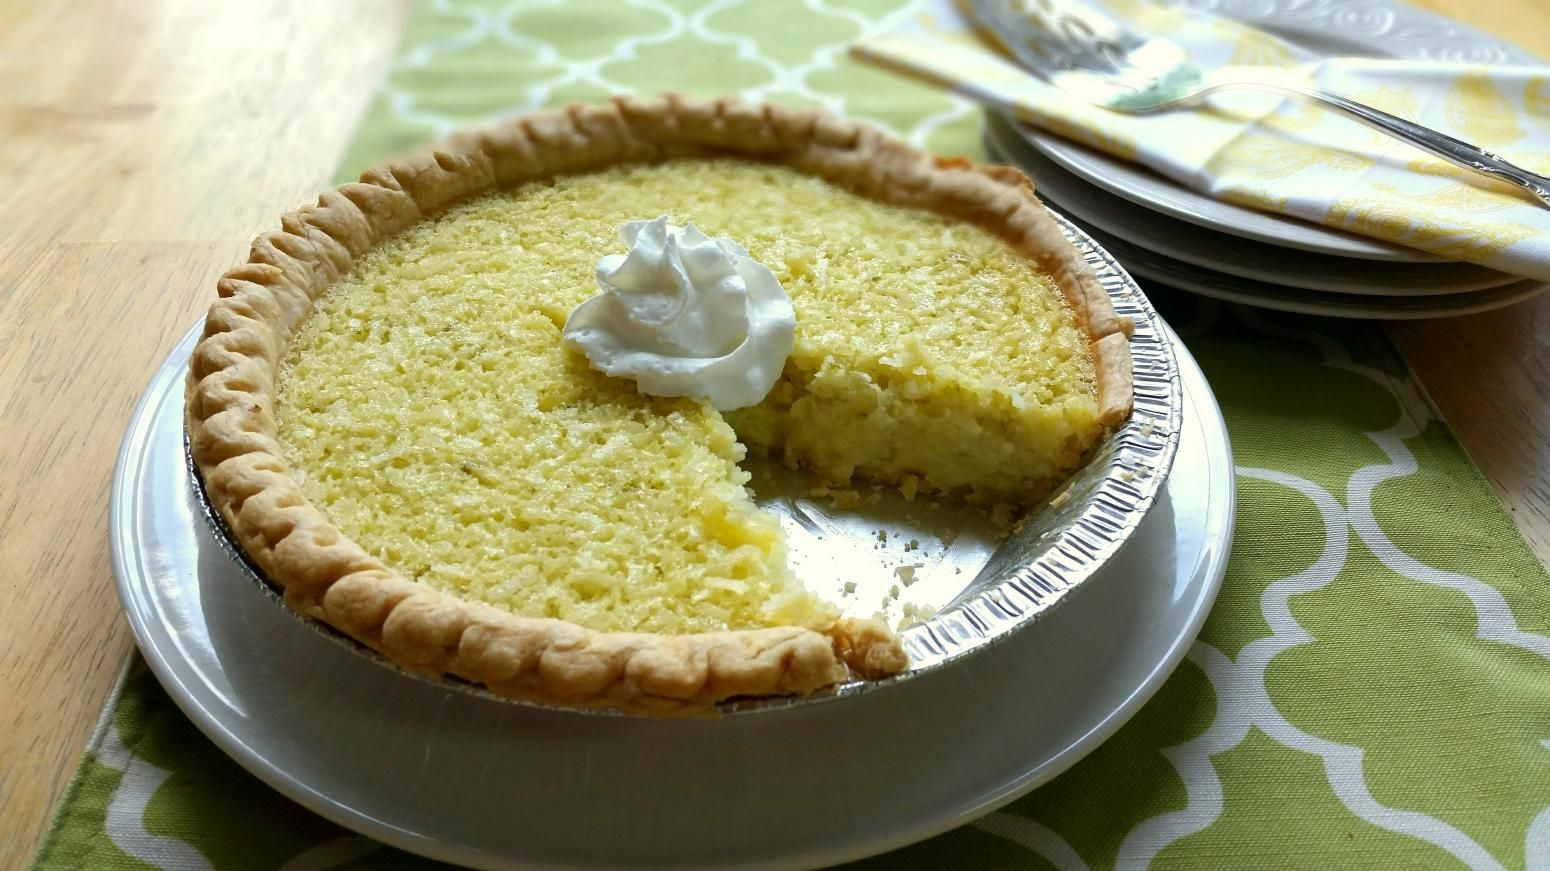 Lime Coconut Buttermilk Pie Recipe Buttermilk Pie Fresh Fruit Pie Recipes Coconut Recipes